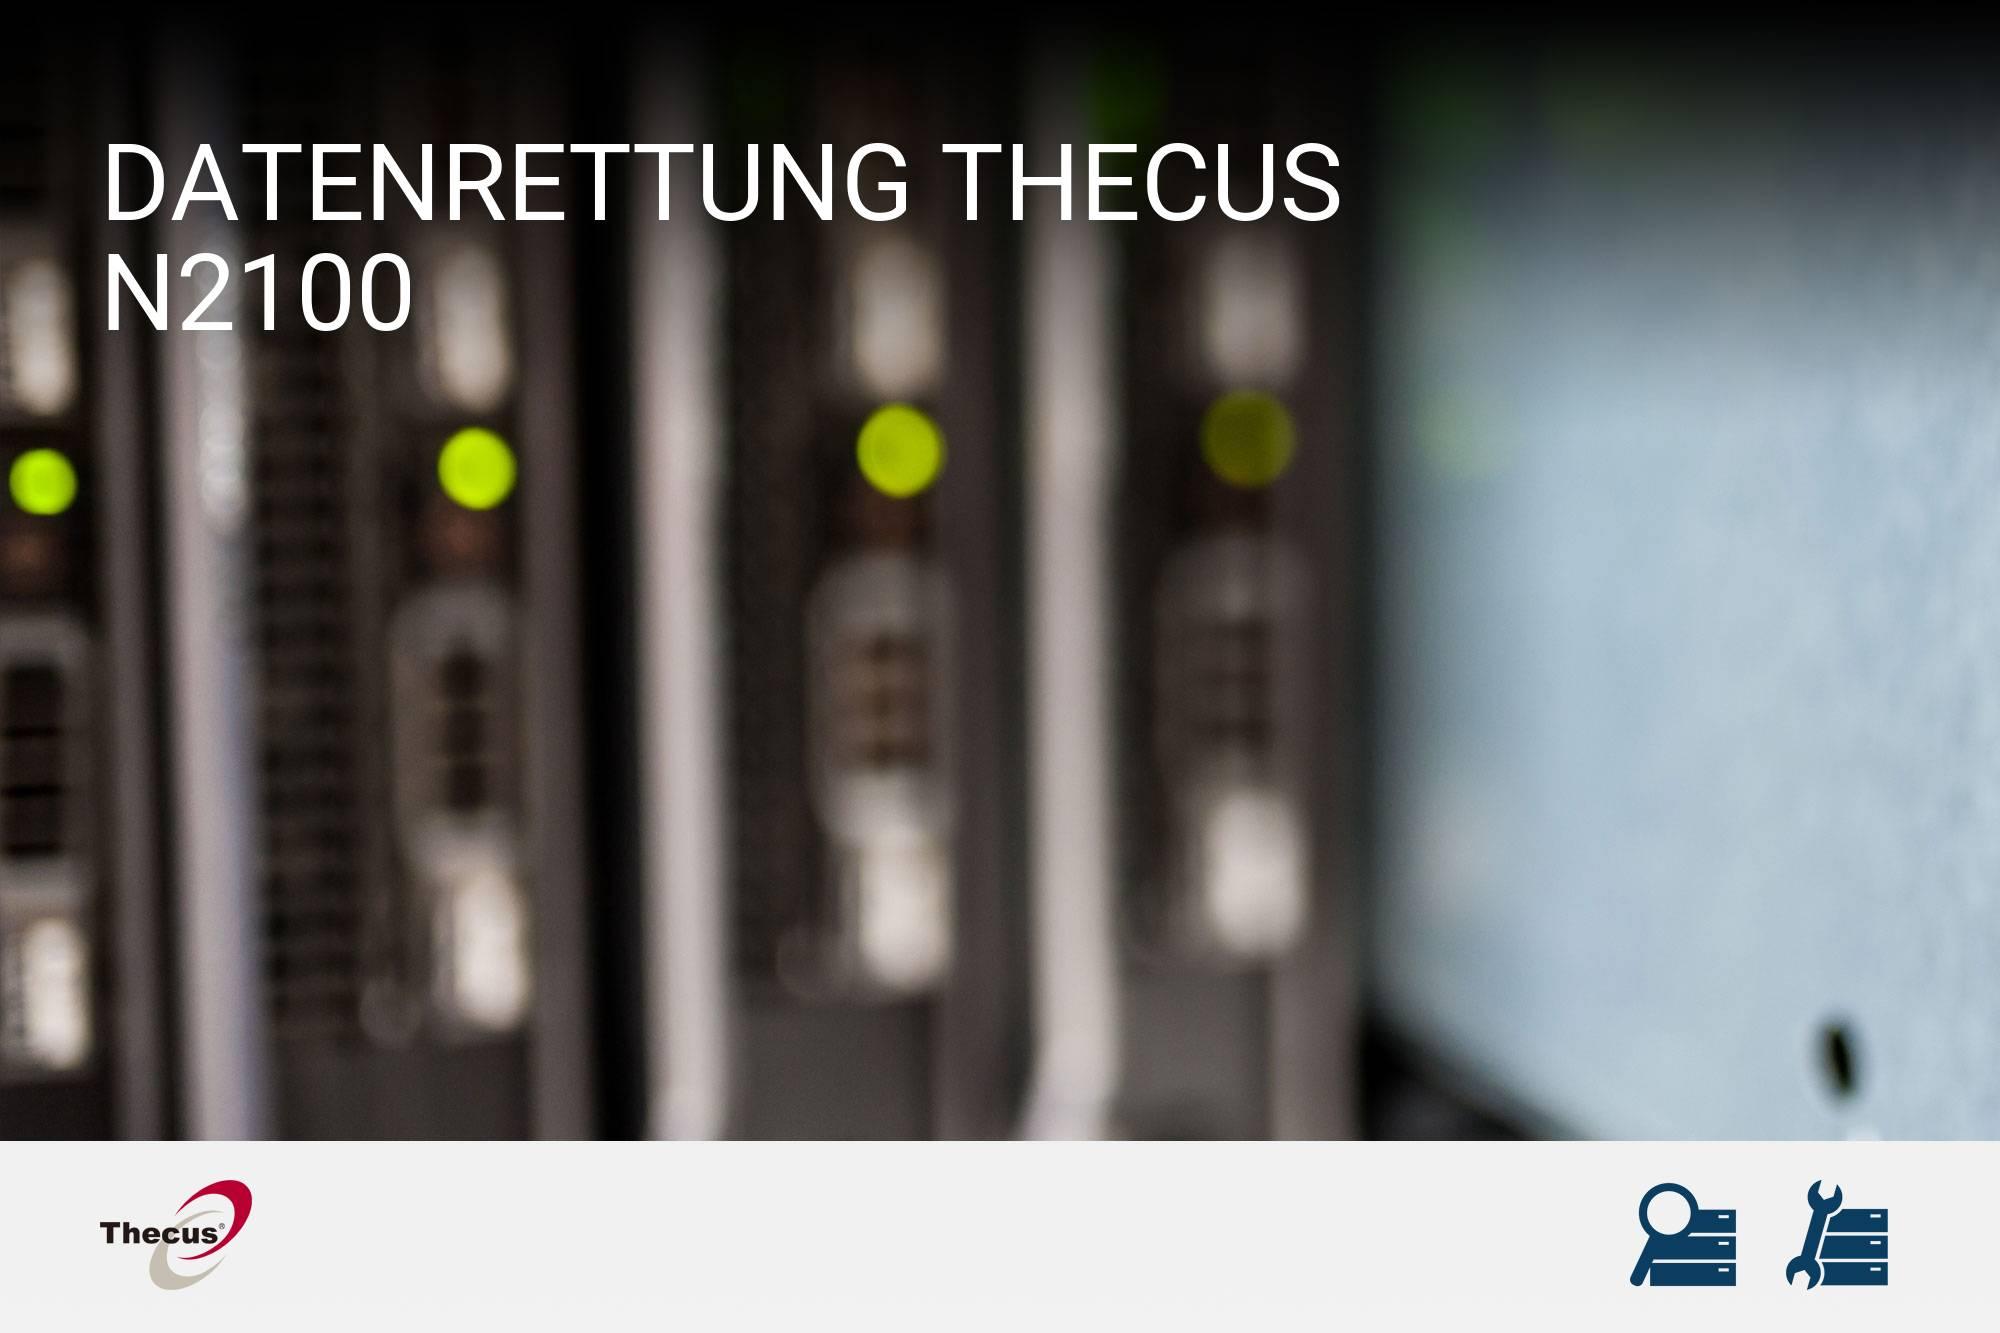 Thecus N2100